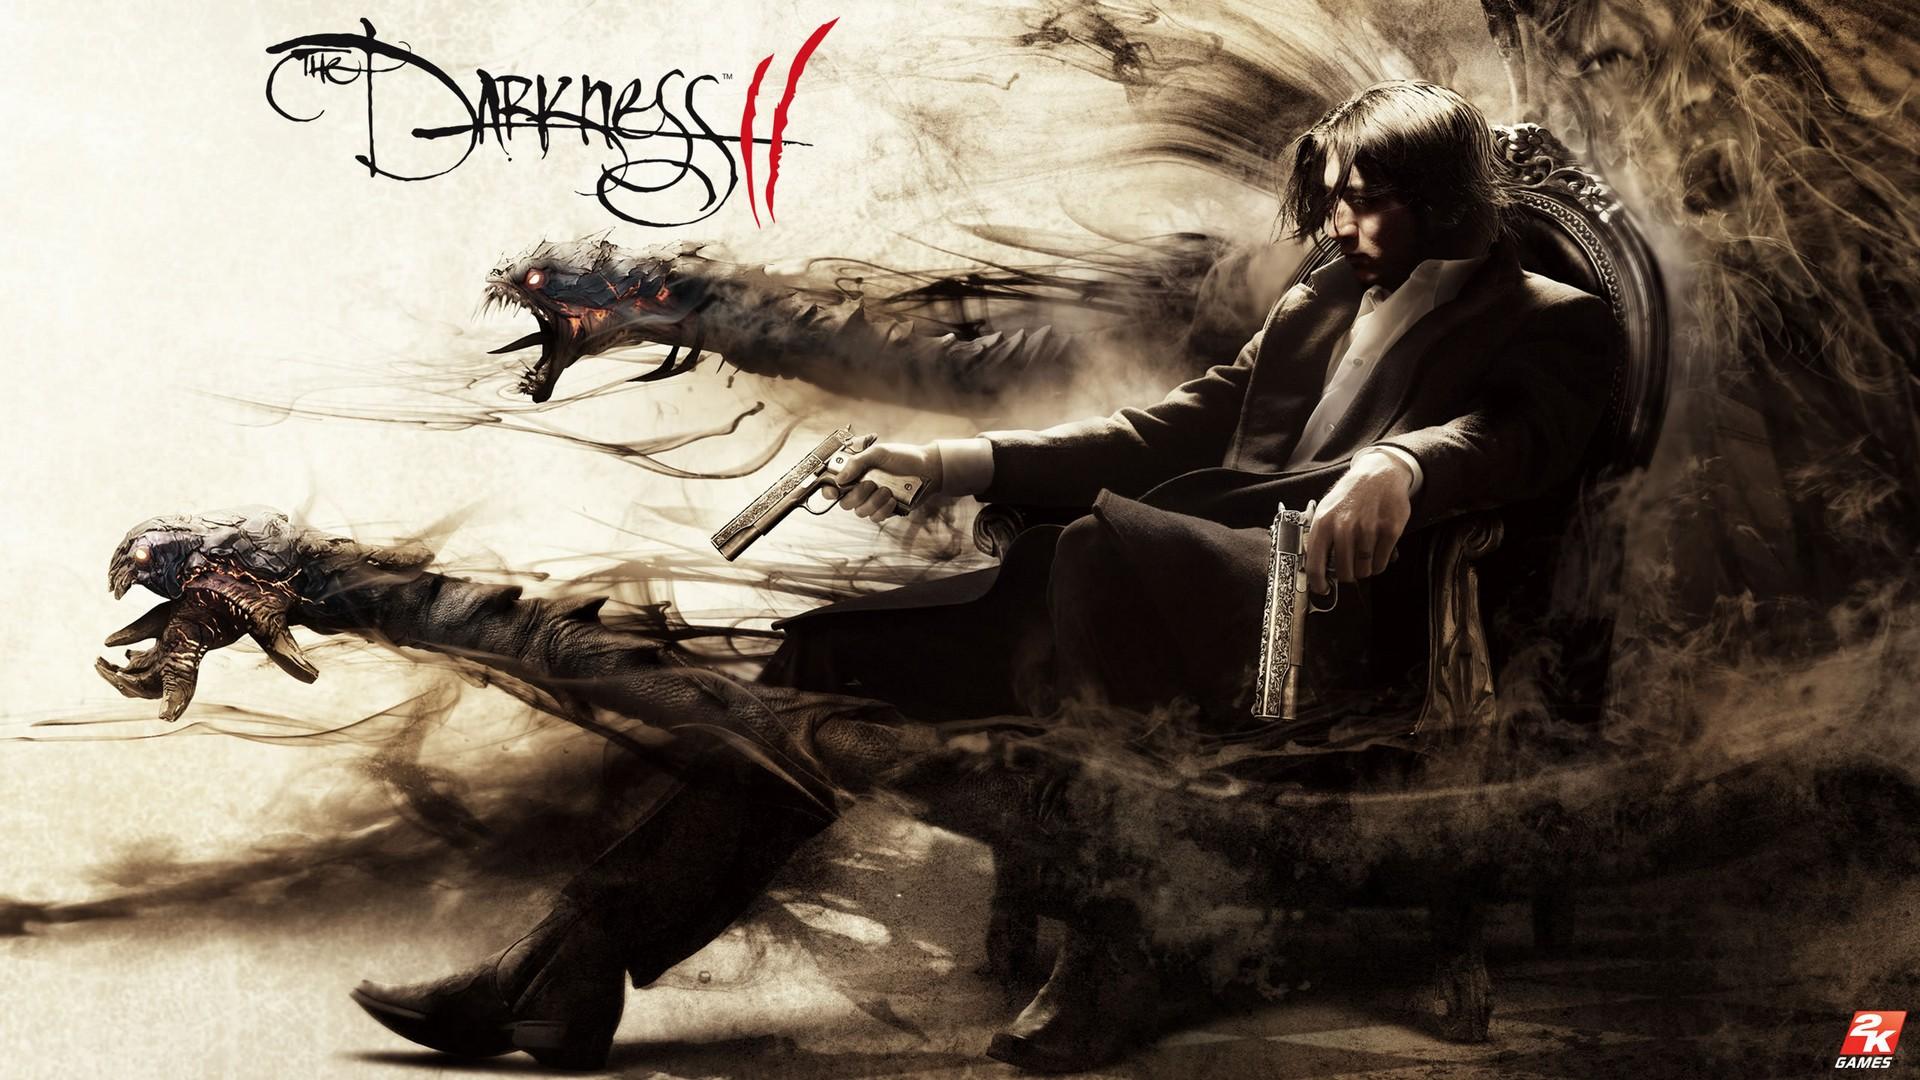 Wallpaper : video games, demon, mythology, The Darkness 2